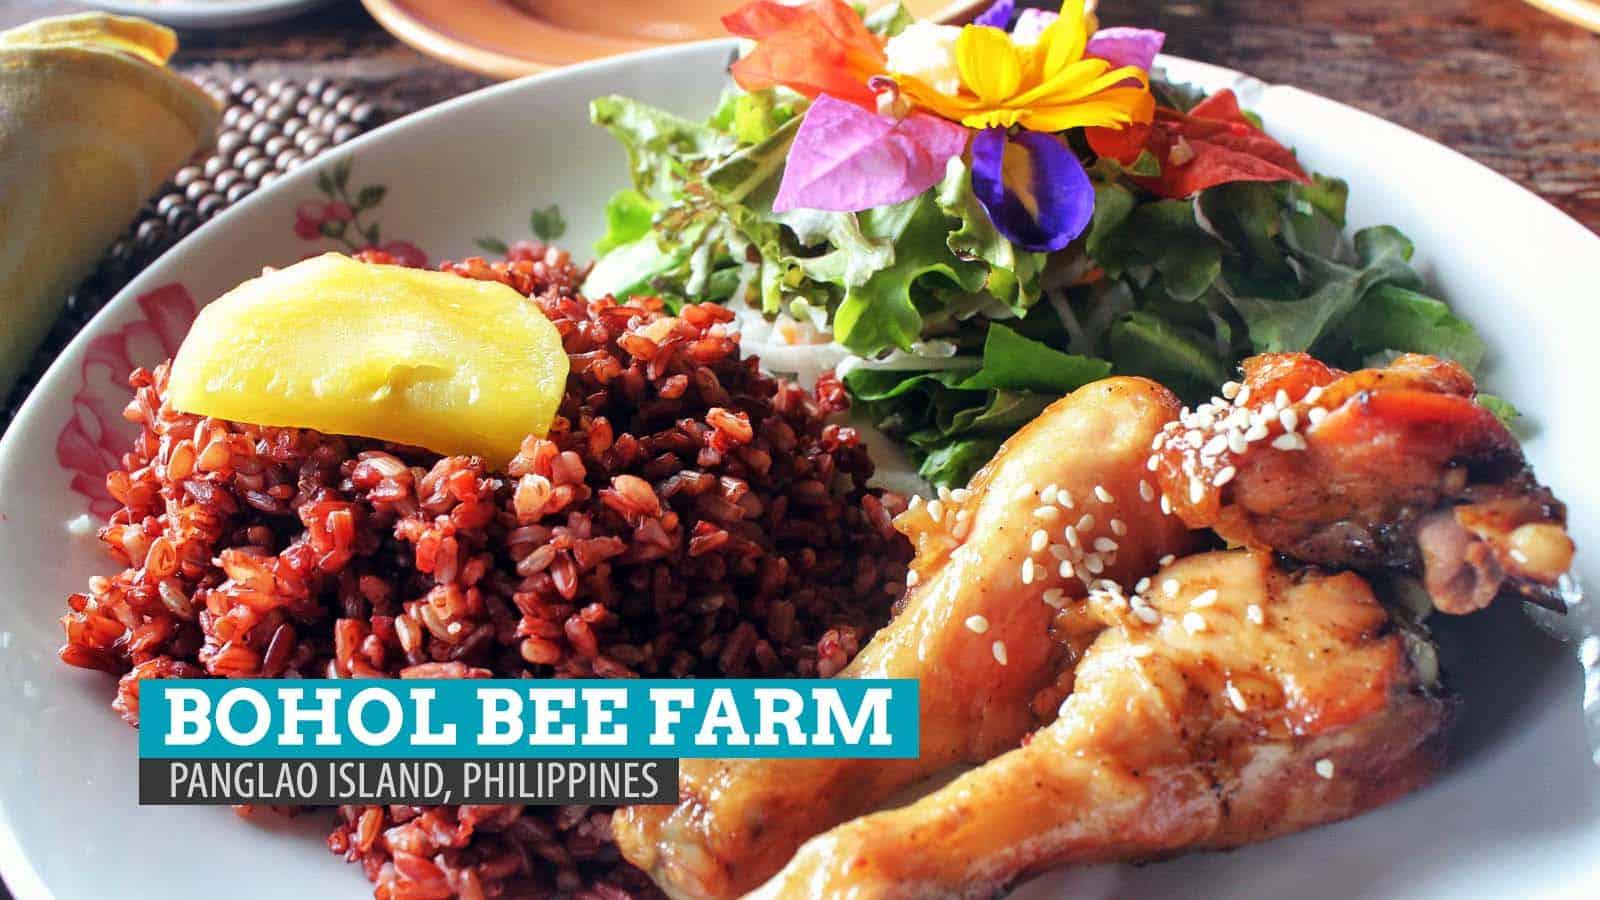 Bohol Bee Farm: A Bee-autiful Dining Experience in Panglao Island